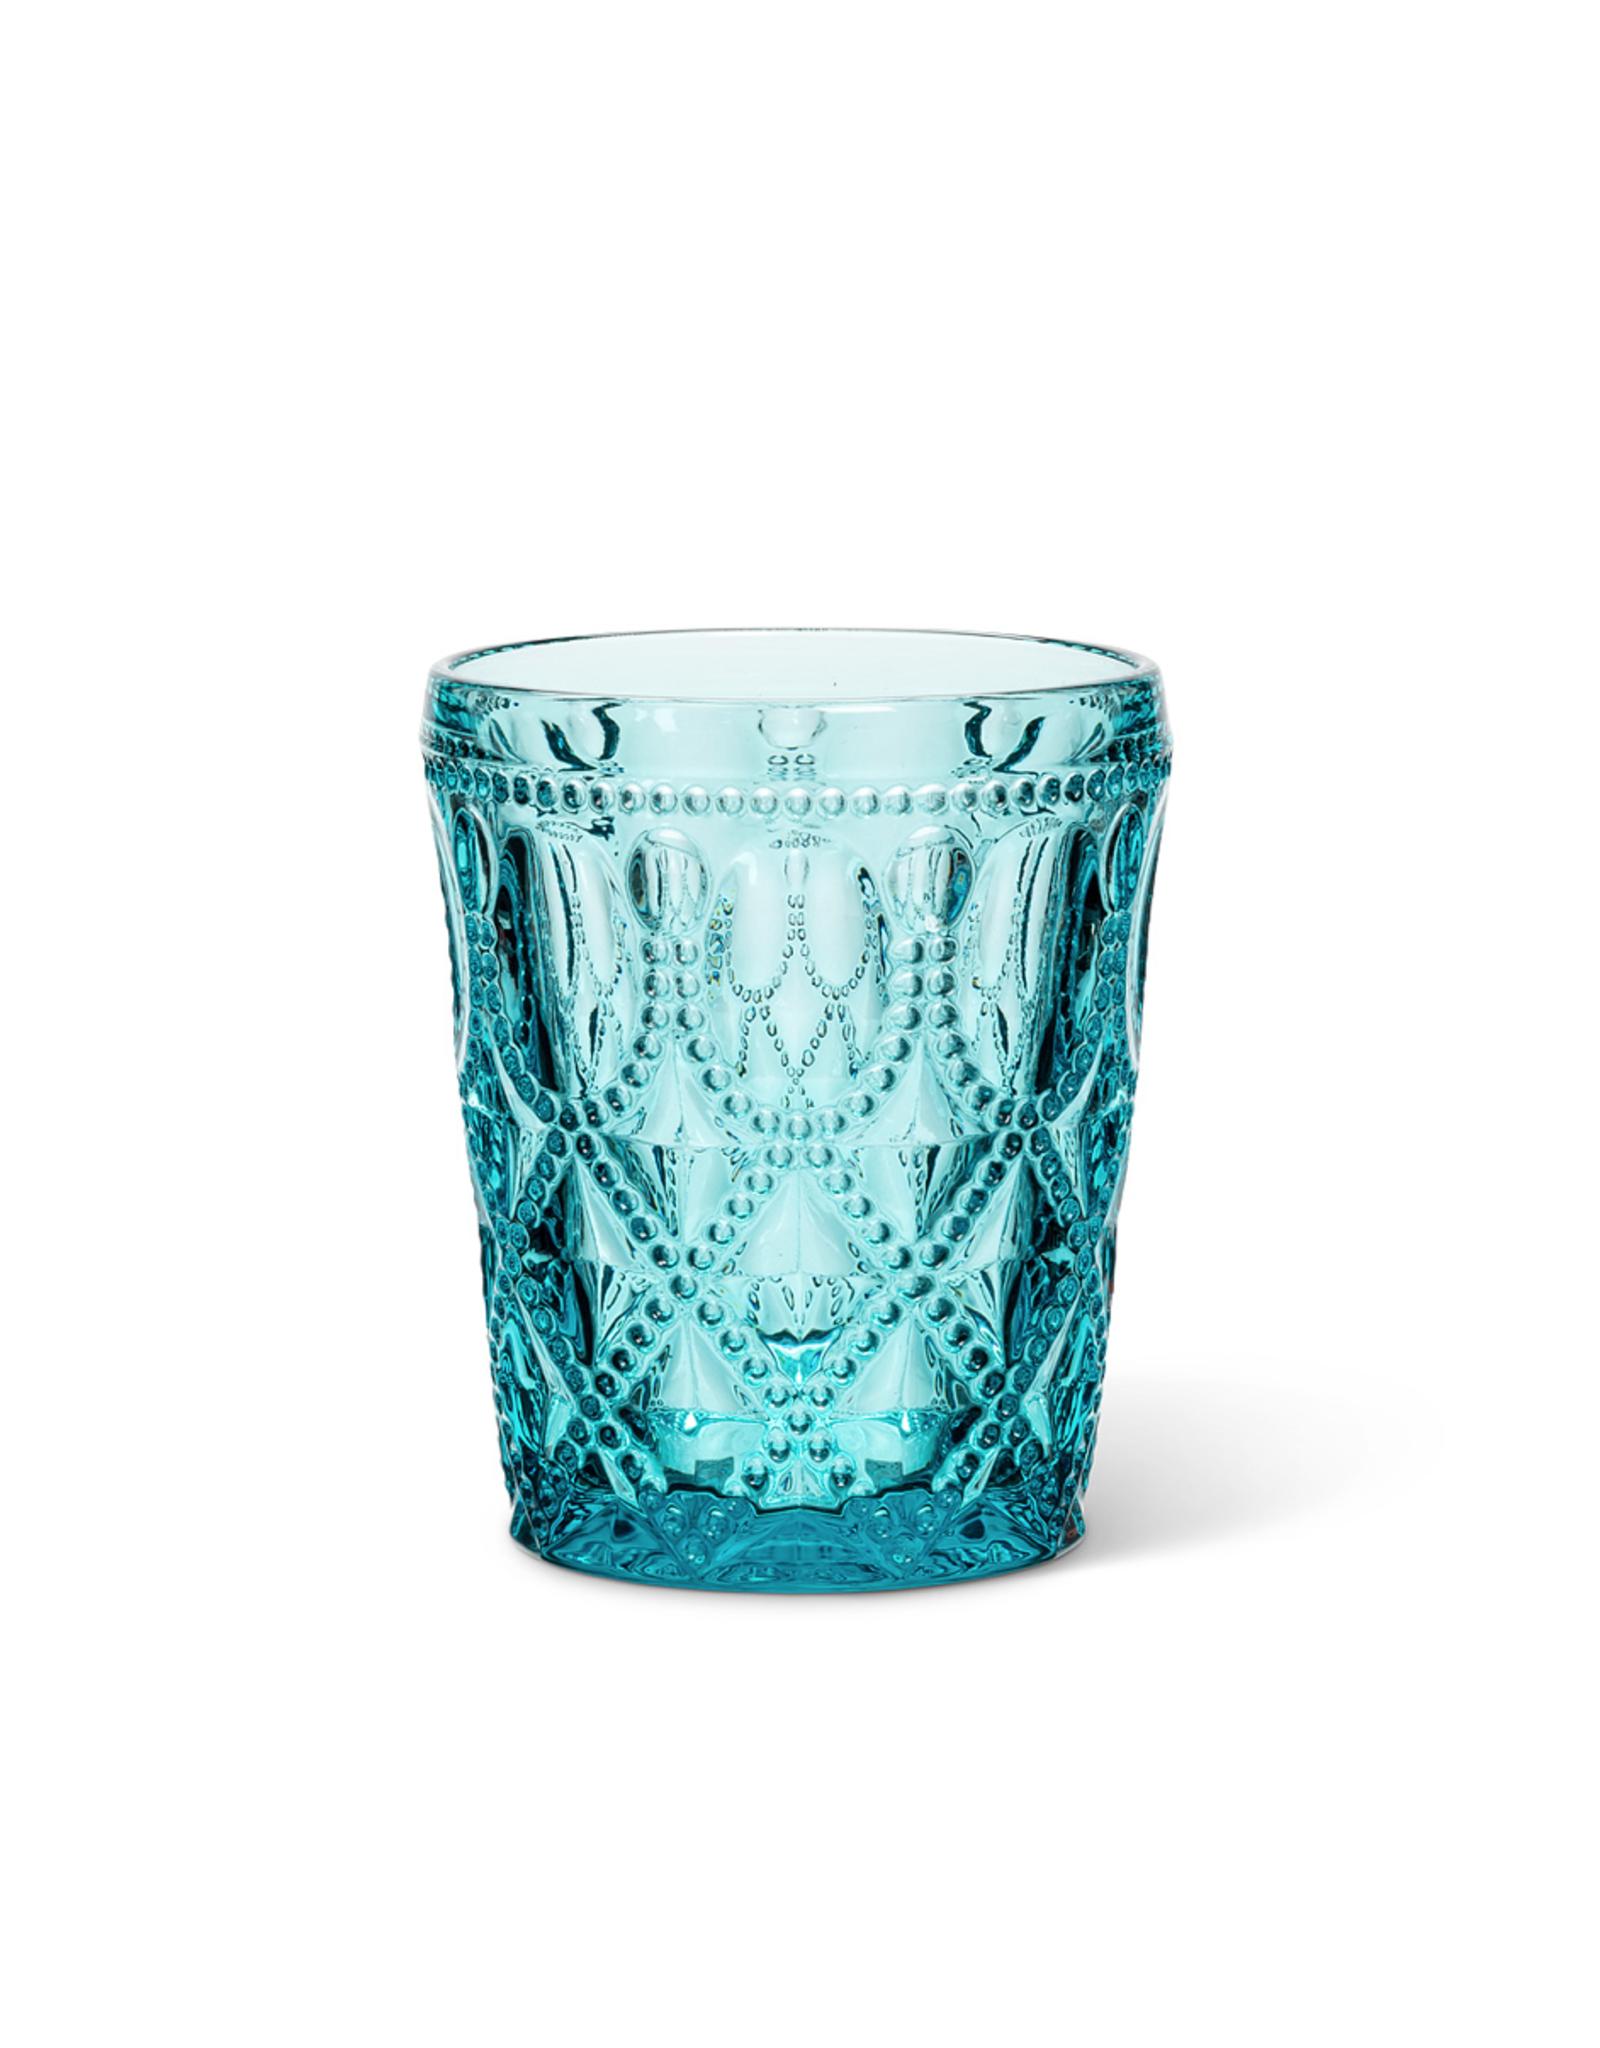 ATT - Tumbler/Jewel, Turquoise, 12oz